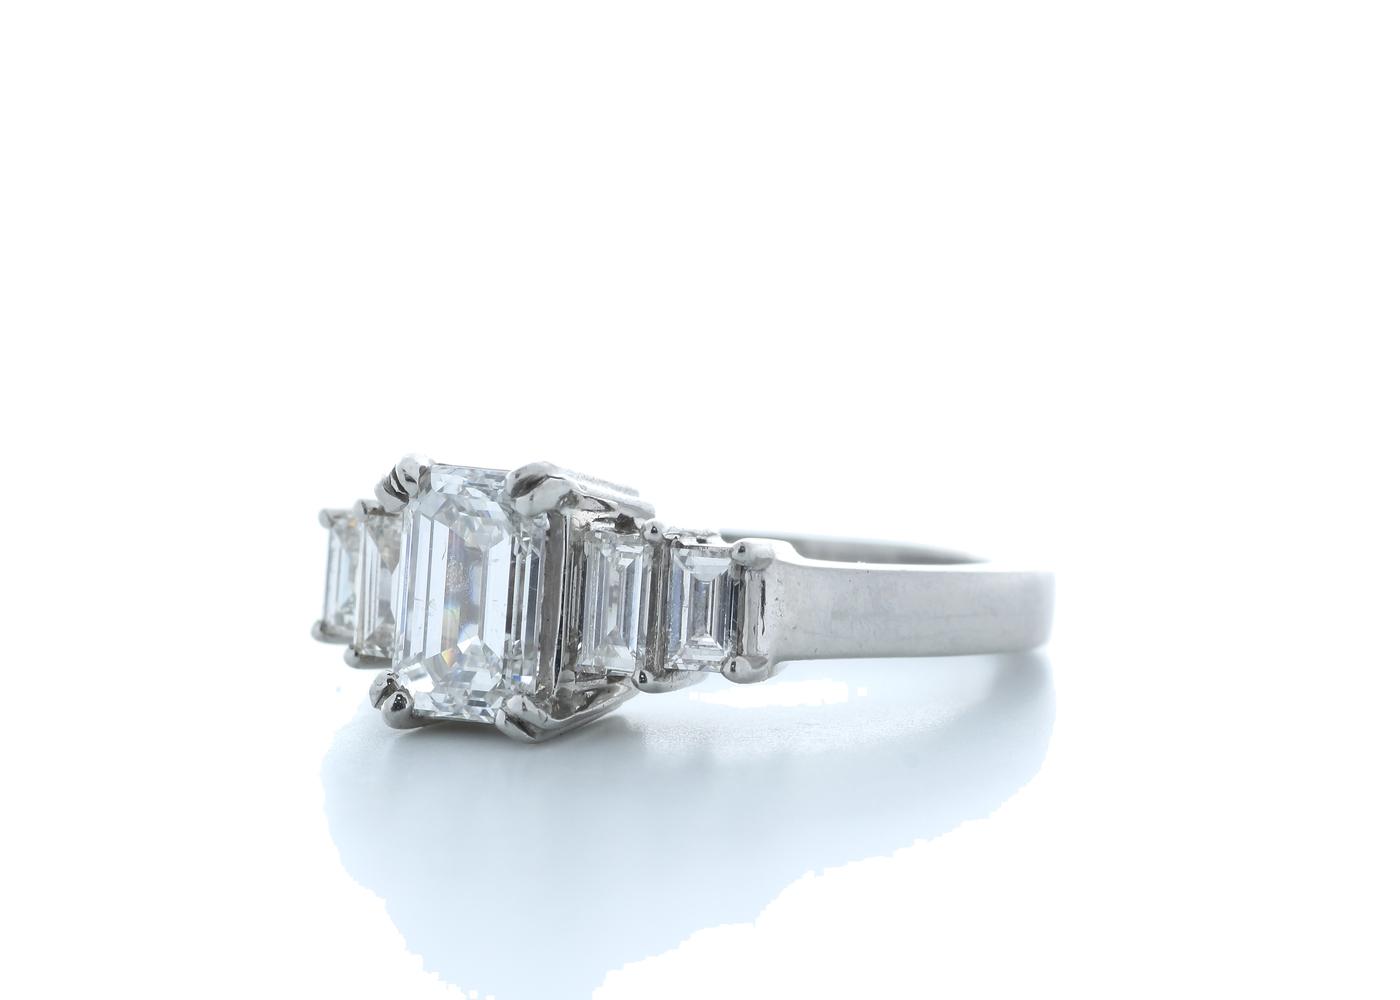 18ct White Gold Emerald Cut Diamond Ring 1.73 (1.23) Carats - Image 2 of 5